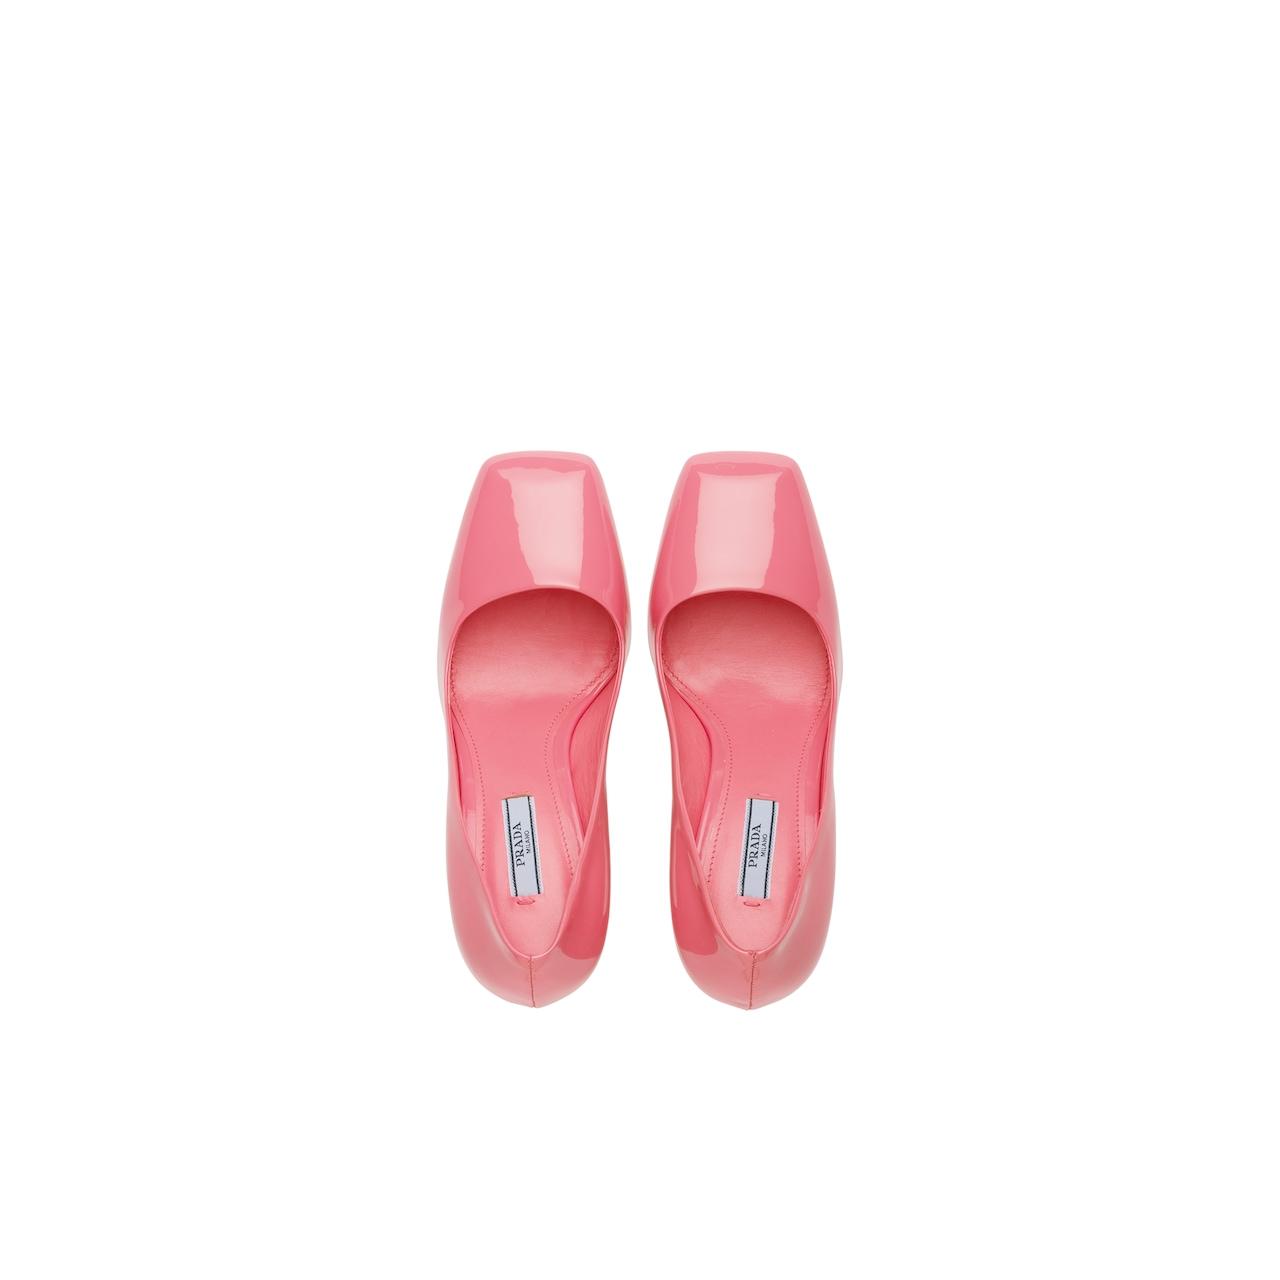 Prada 漆皮高跟鞋 4